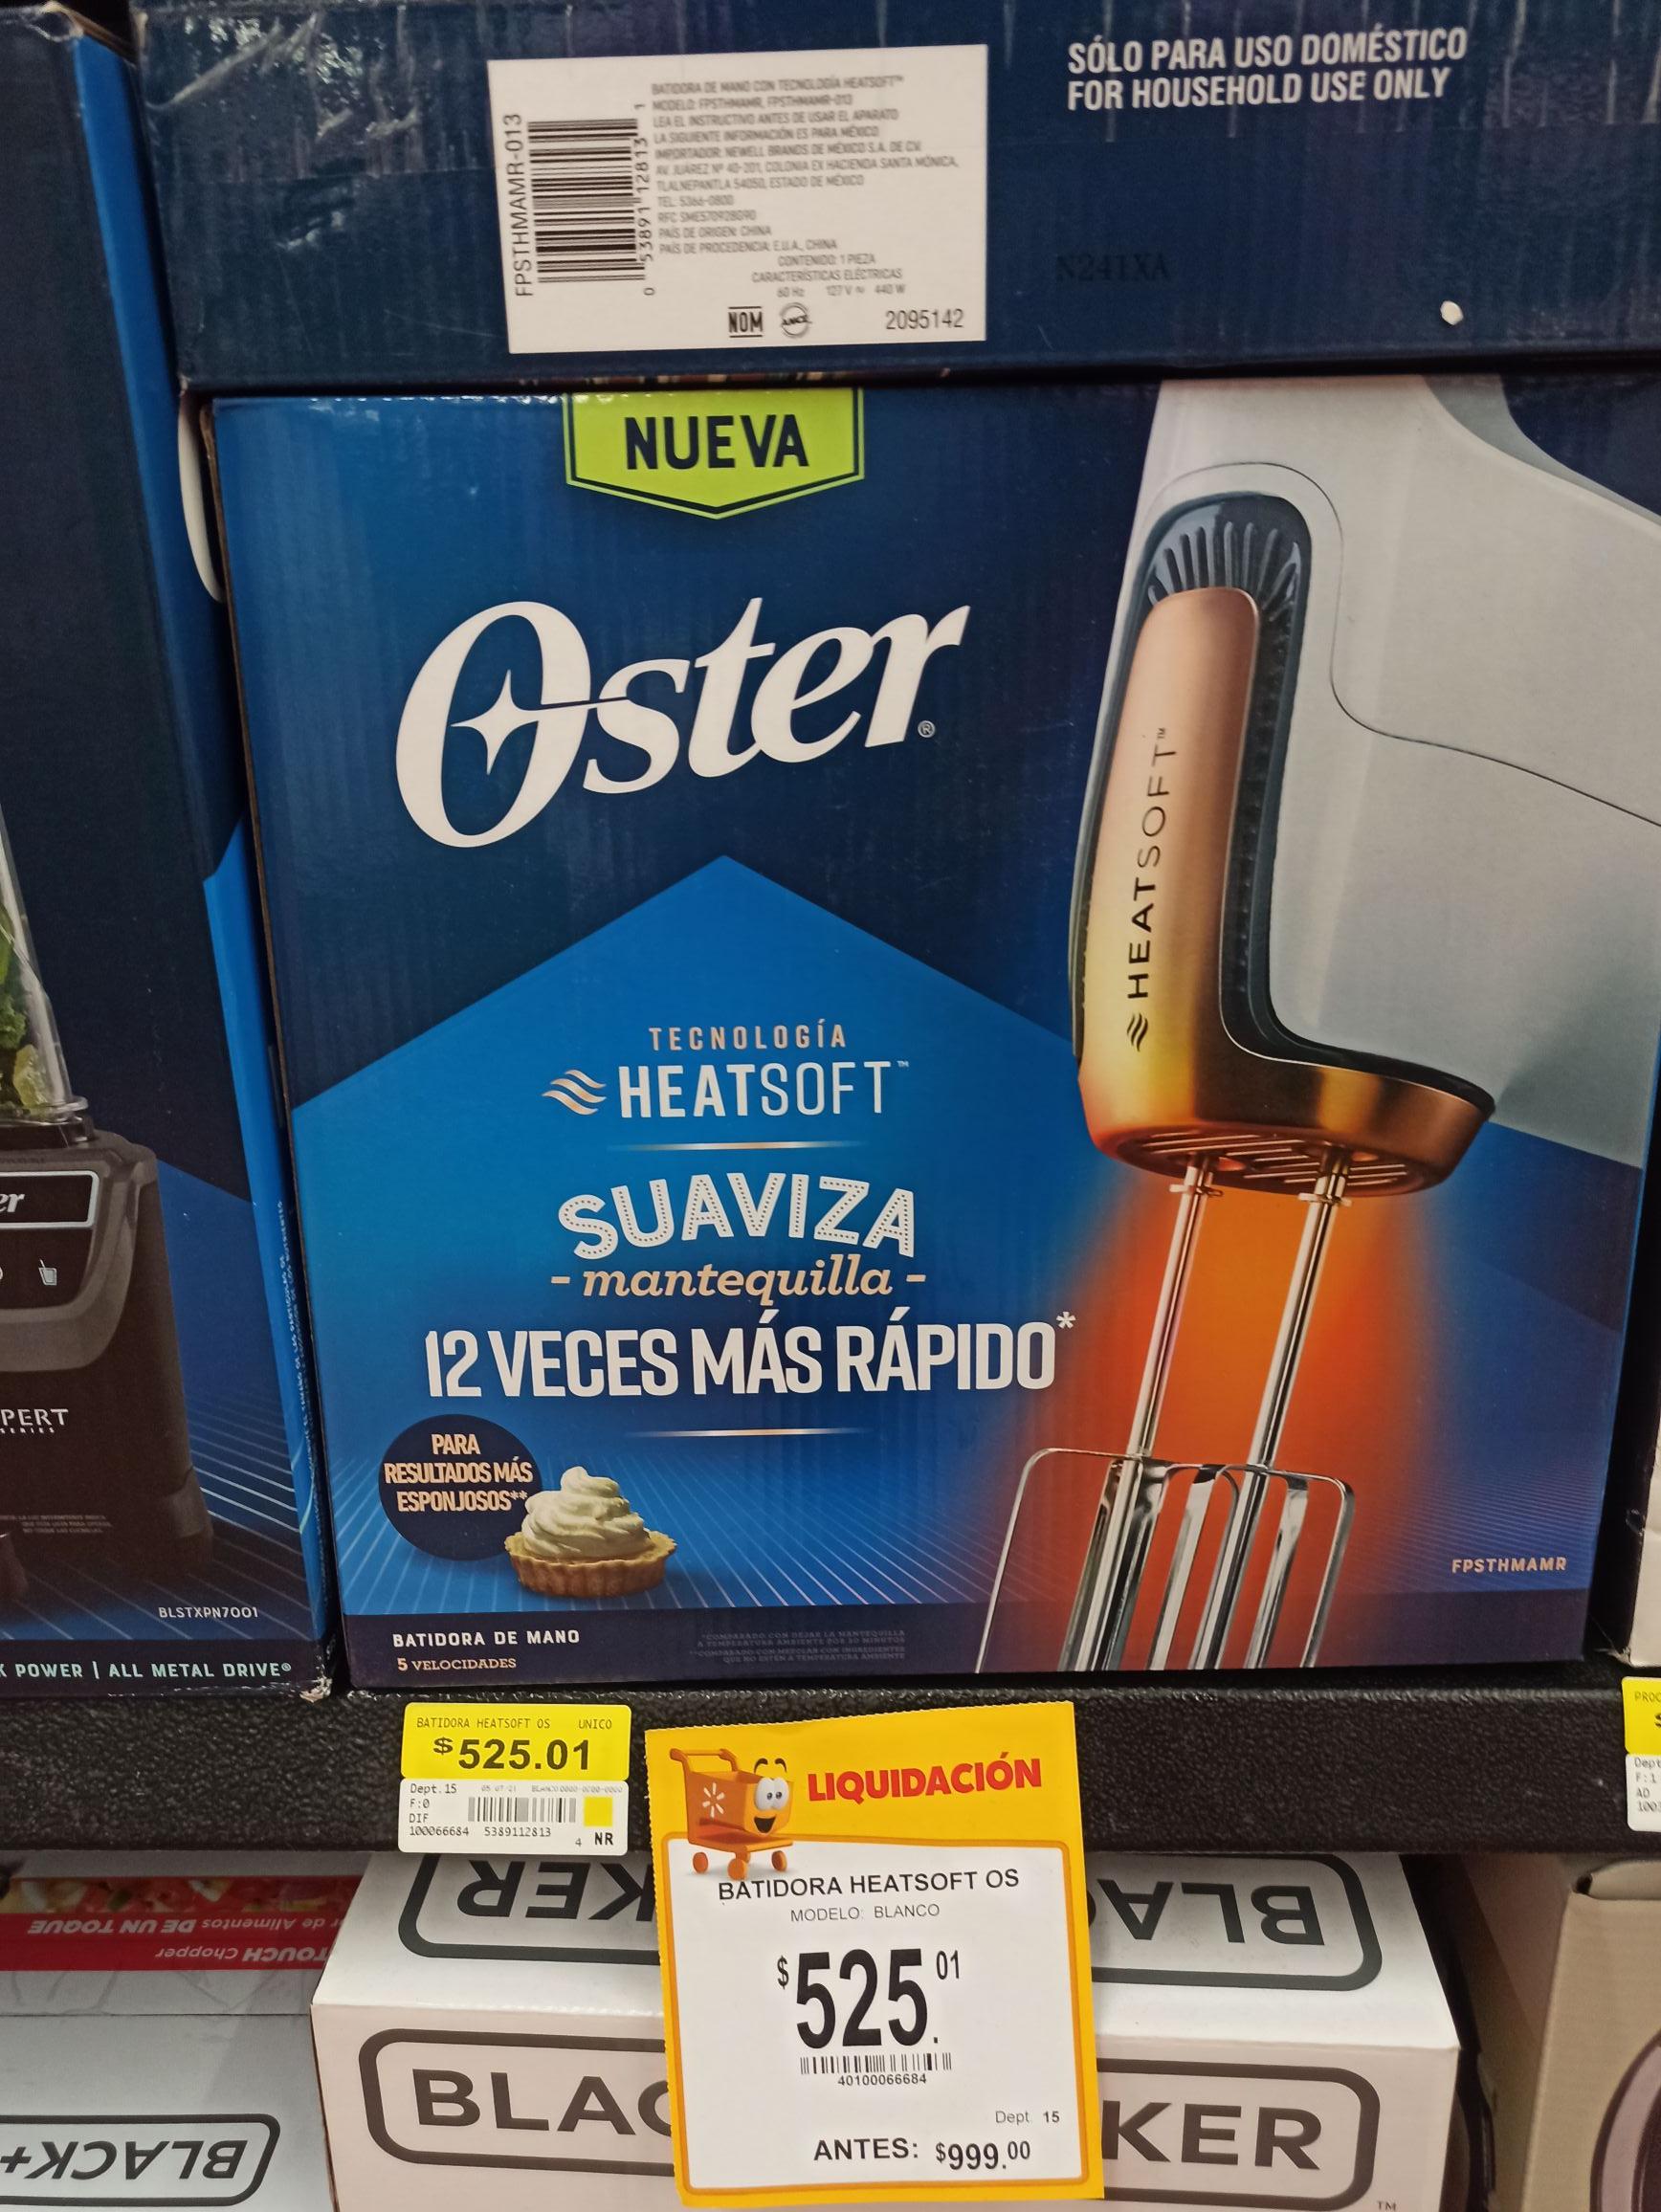 Batidora Oster Heatsoft - Walmart Mérida paseo de Montejo